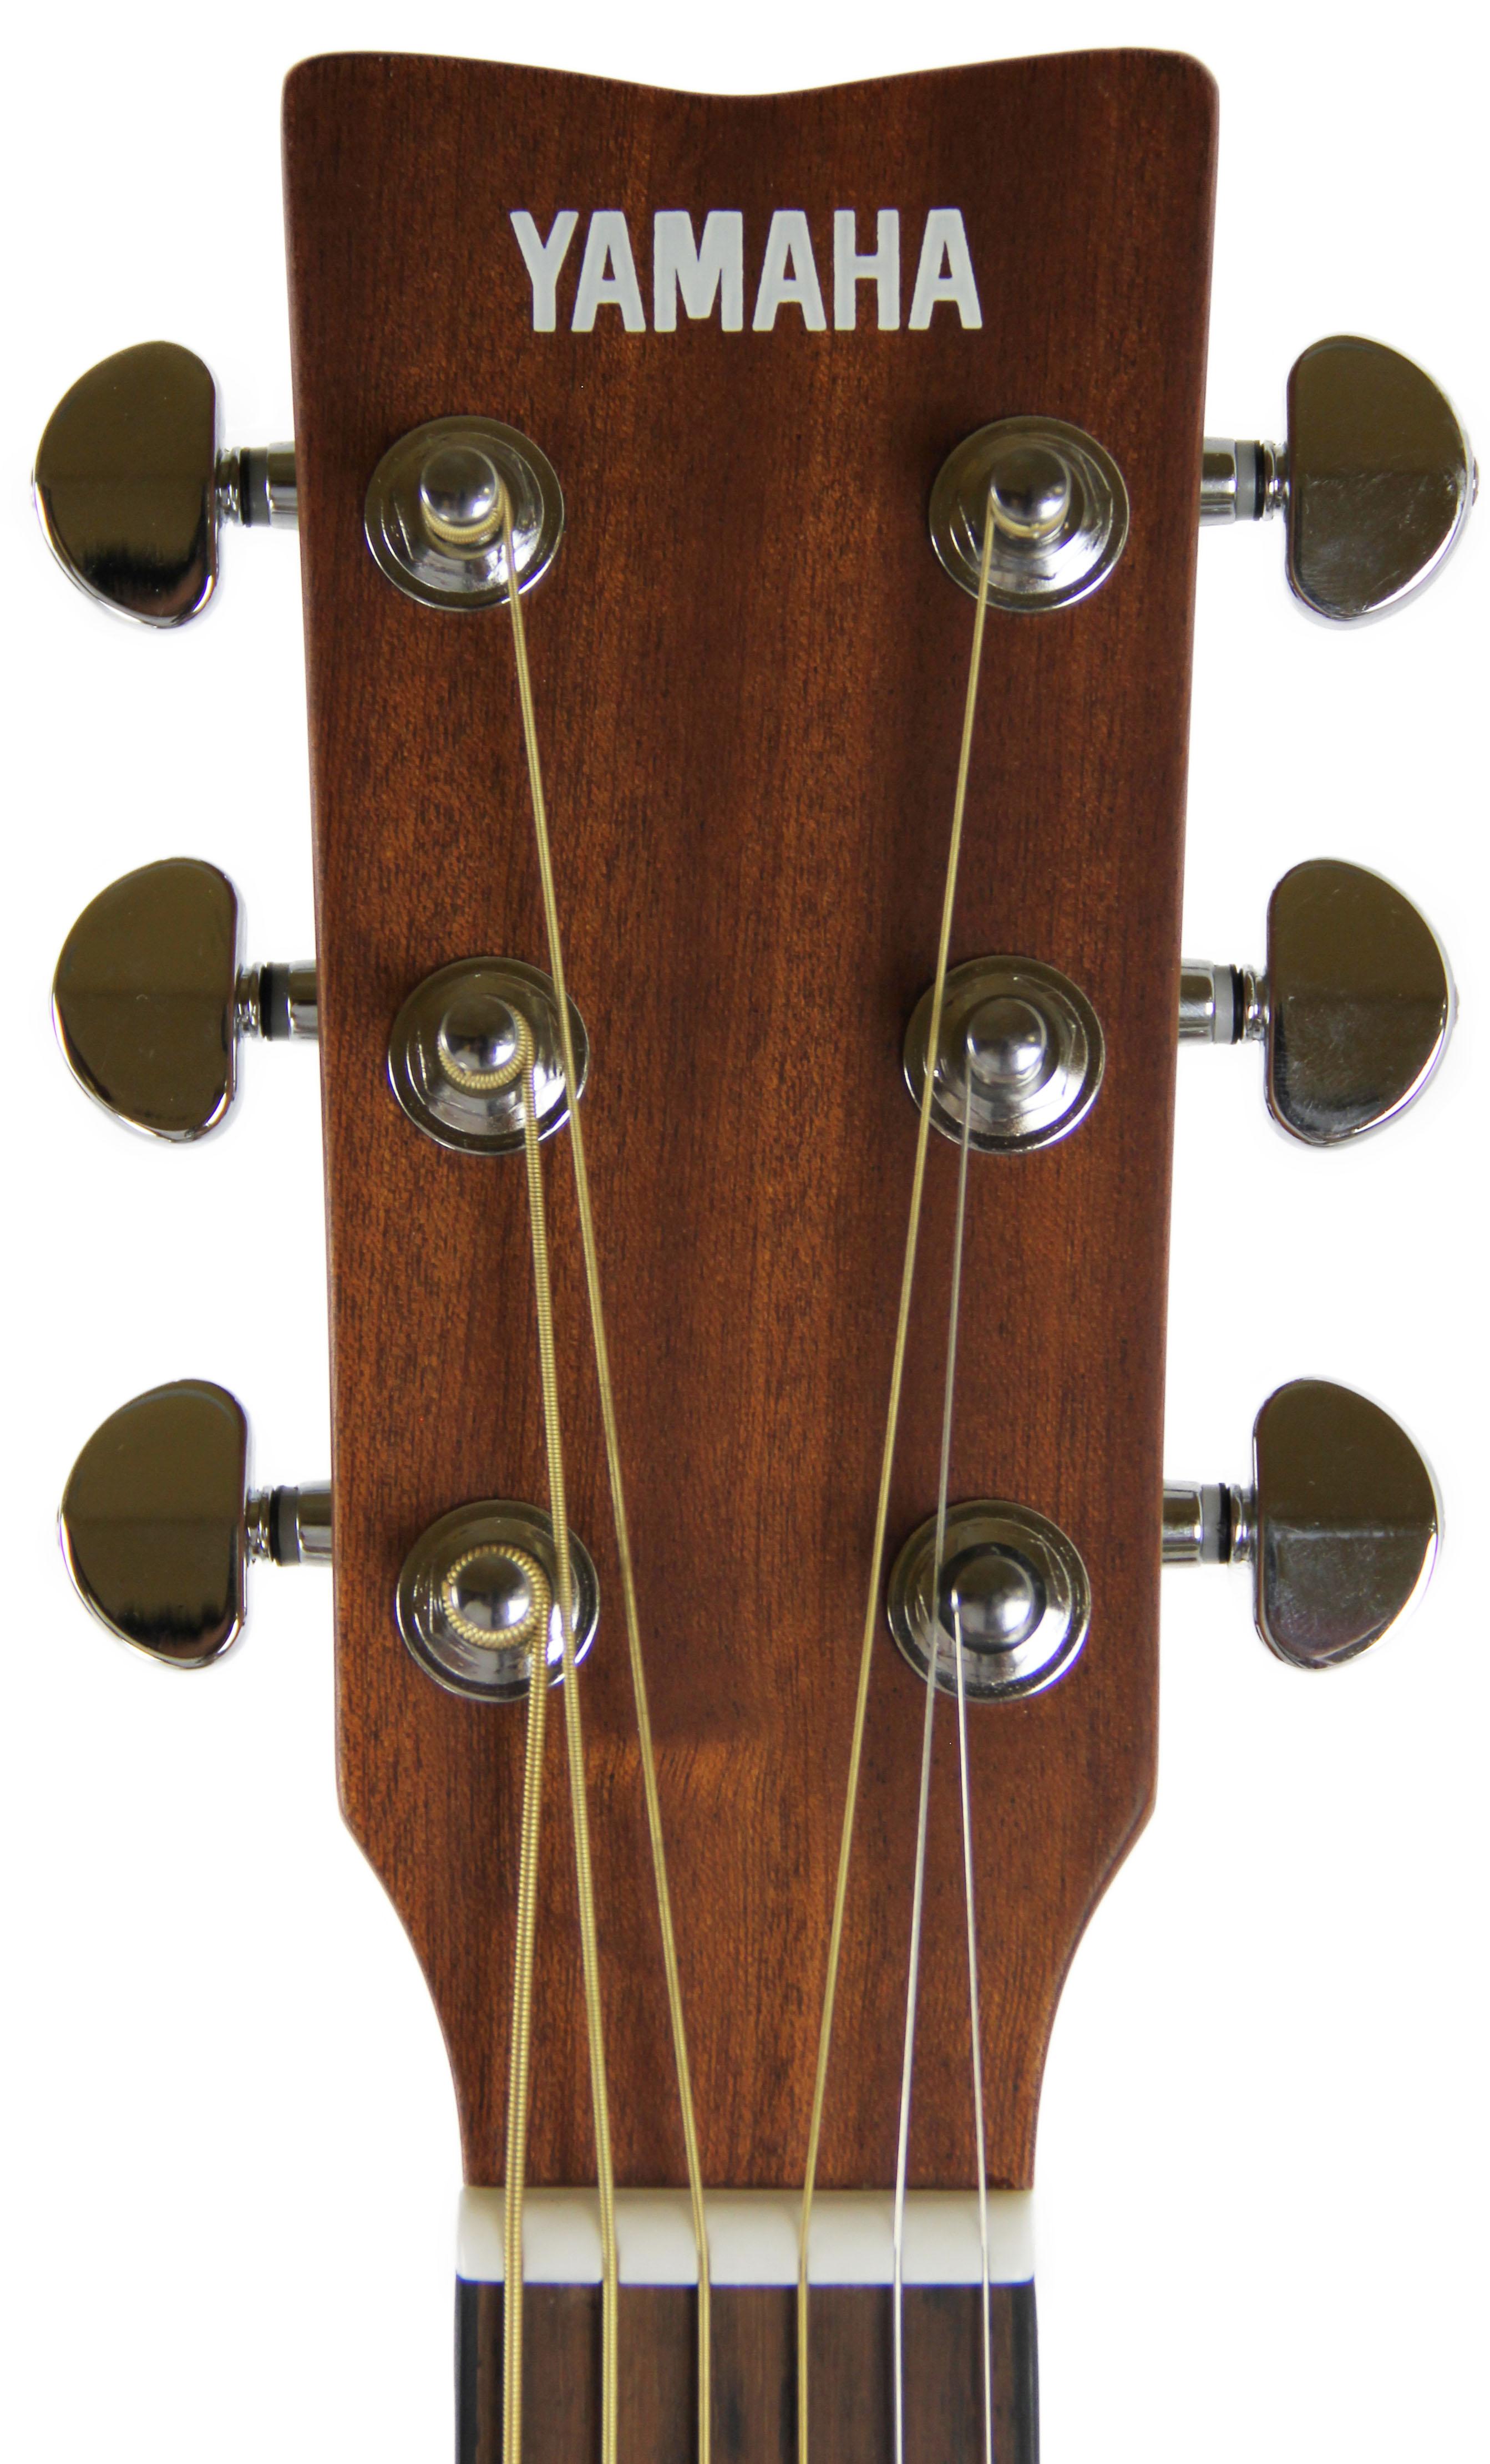 yamaha f325d dreadnought acoustic guitar natural w hard case 660845713642 ebay. Black Bedroom Furniture Sets. Home Design Ideas